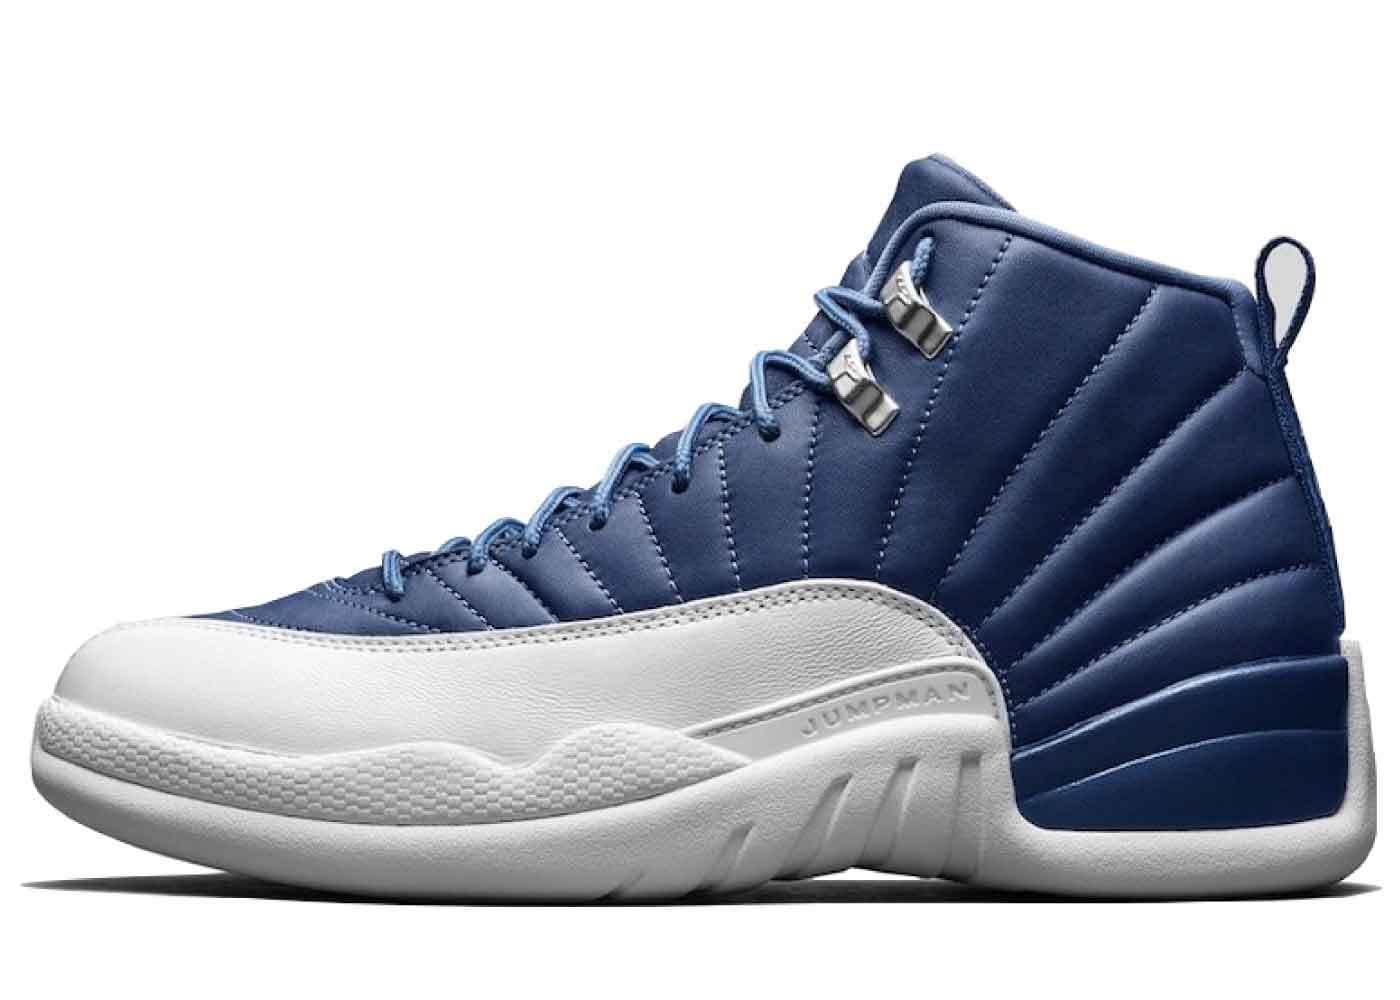 Nike Air Jordan 12 Retro Stone Blueの写真